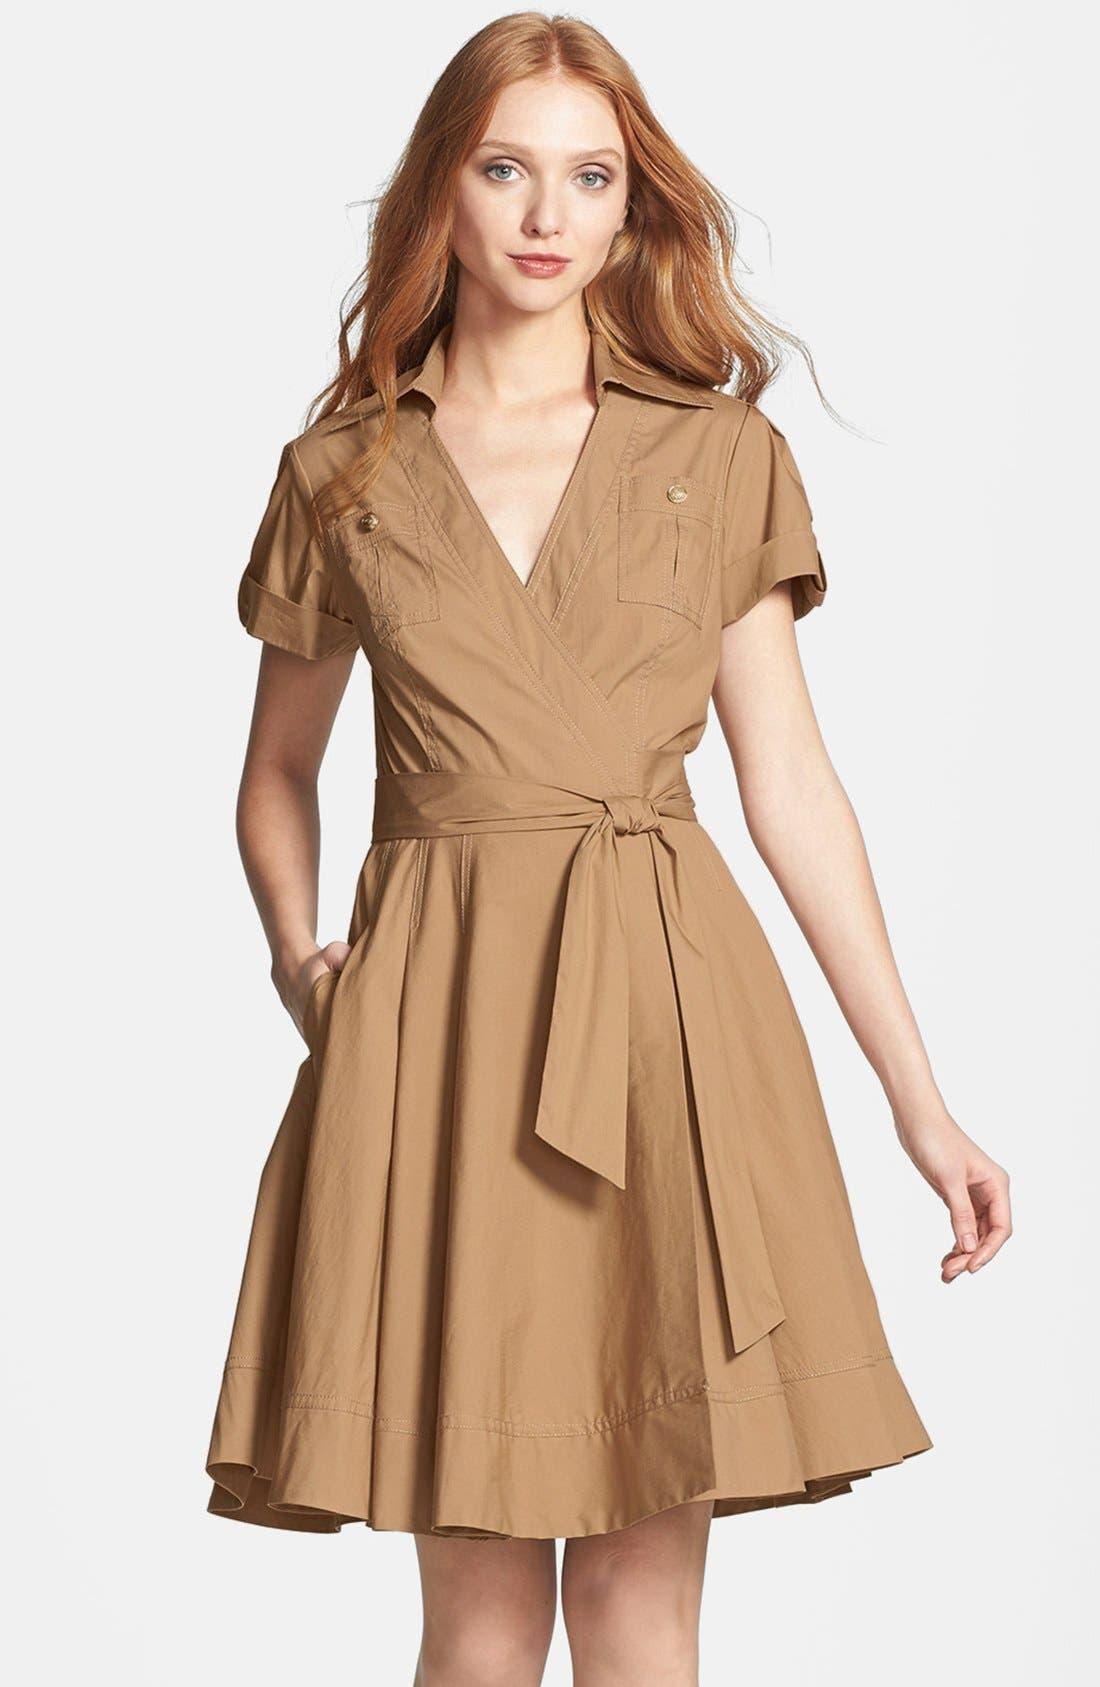 'Kaley' Pleated Cotton Blend Wrap Dress,                             Alternate thumbnail 4, color,                             250